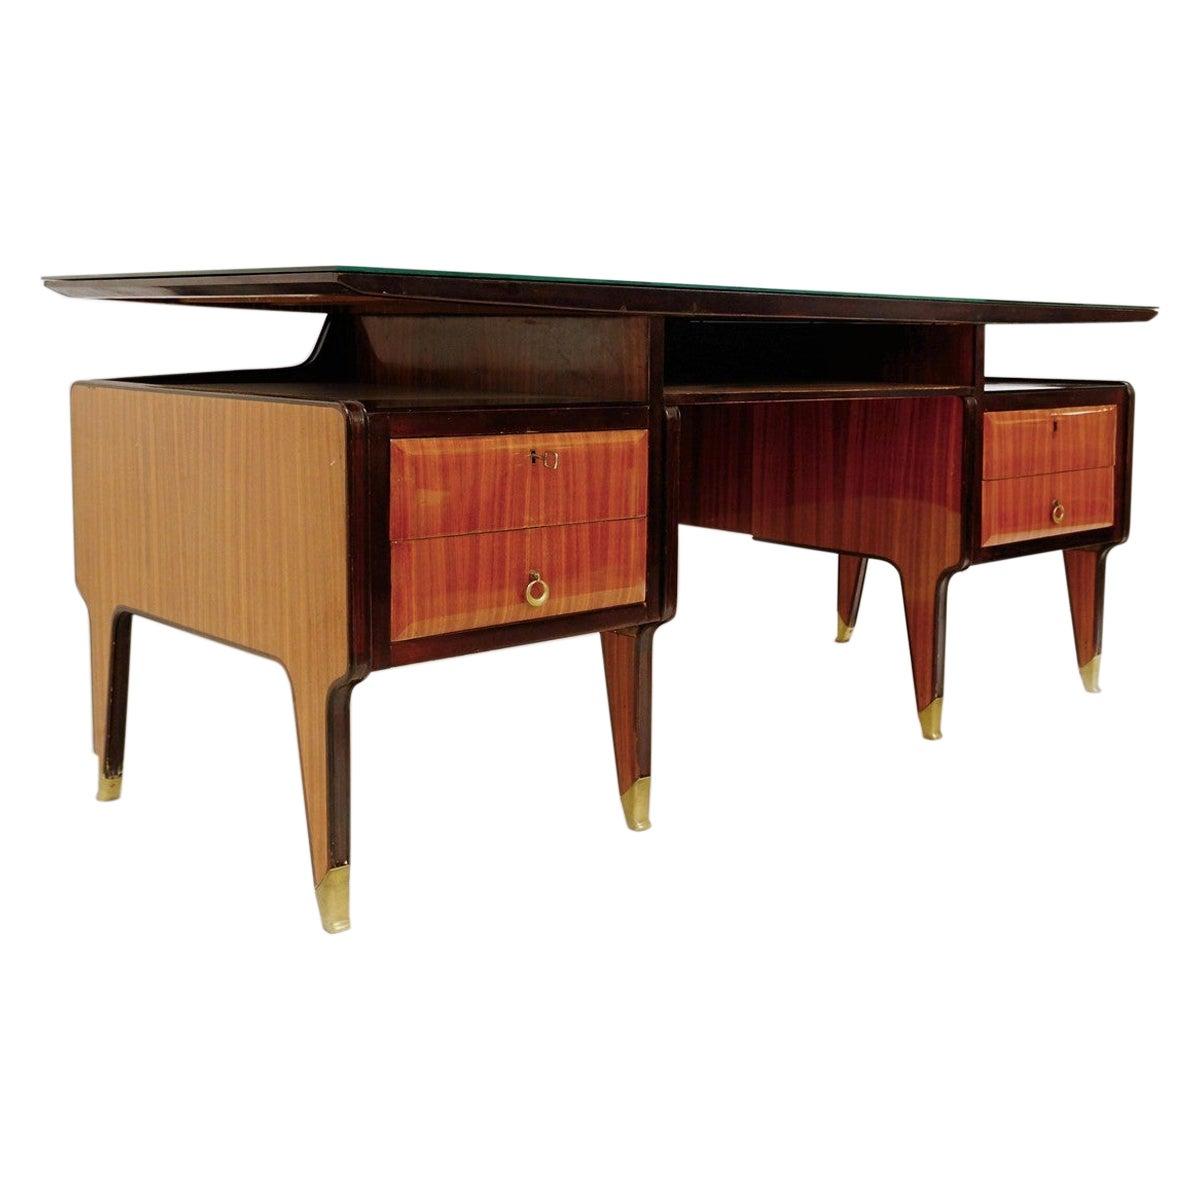 Vittorio Dassi Executive Desk, 1950s